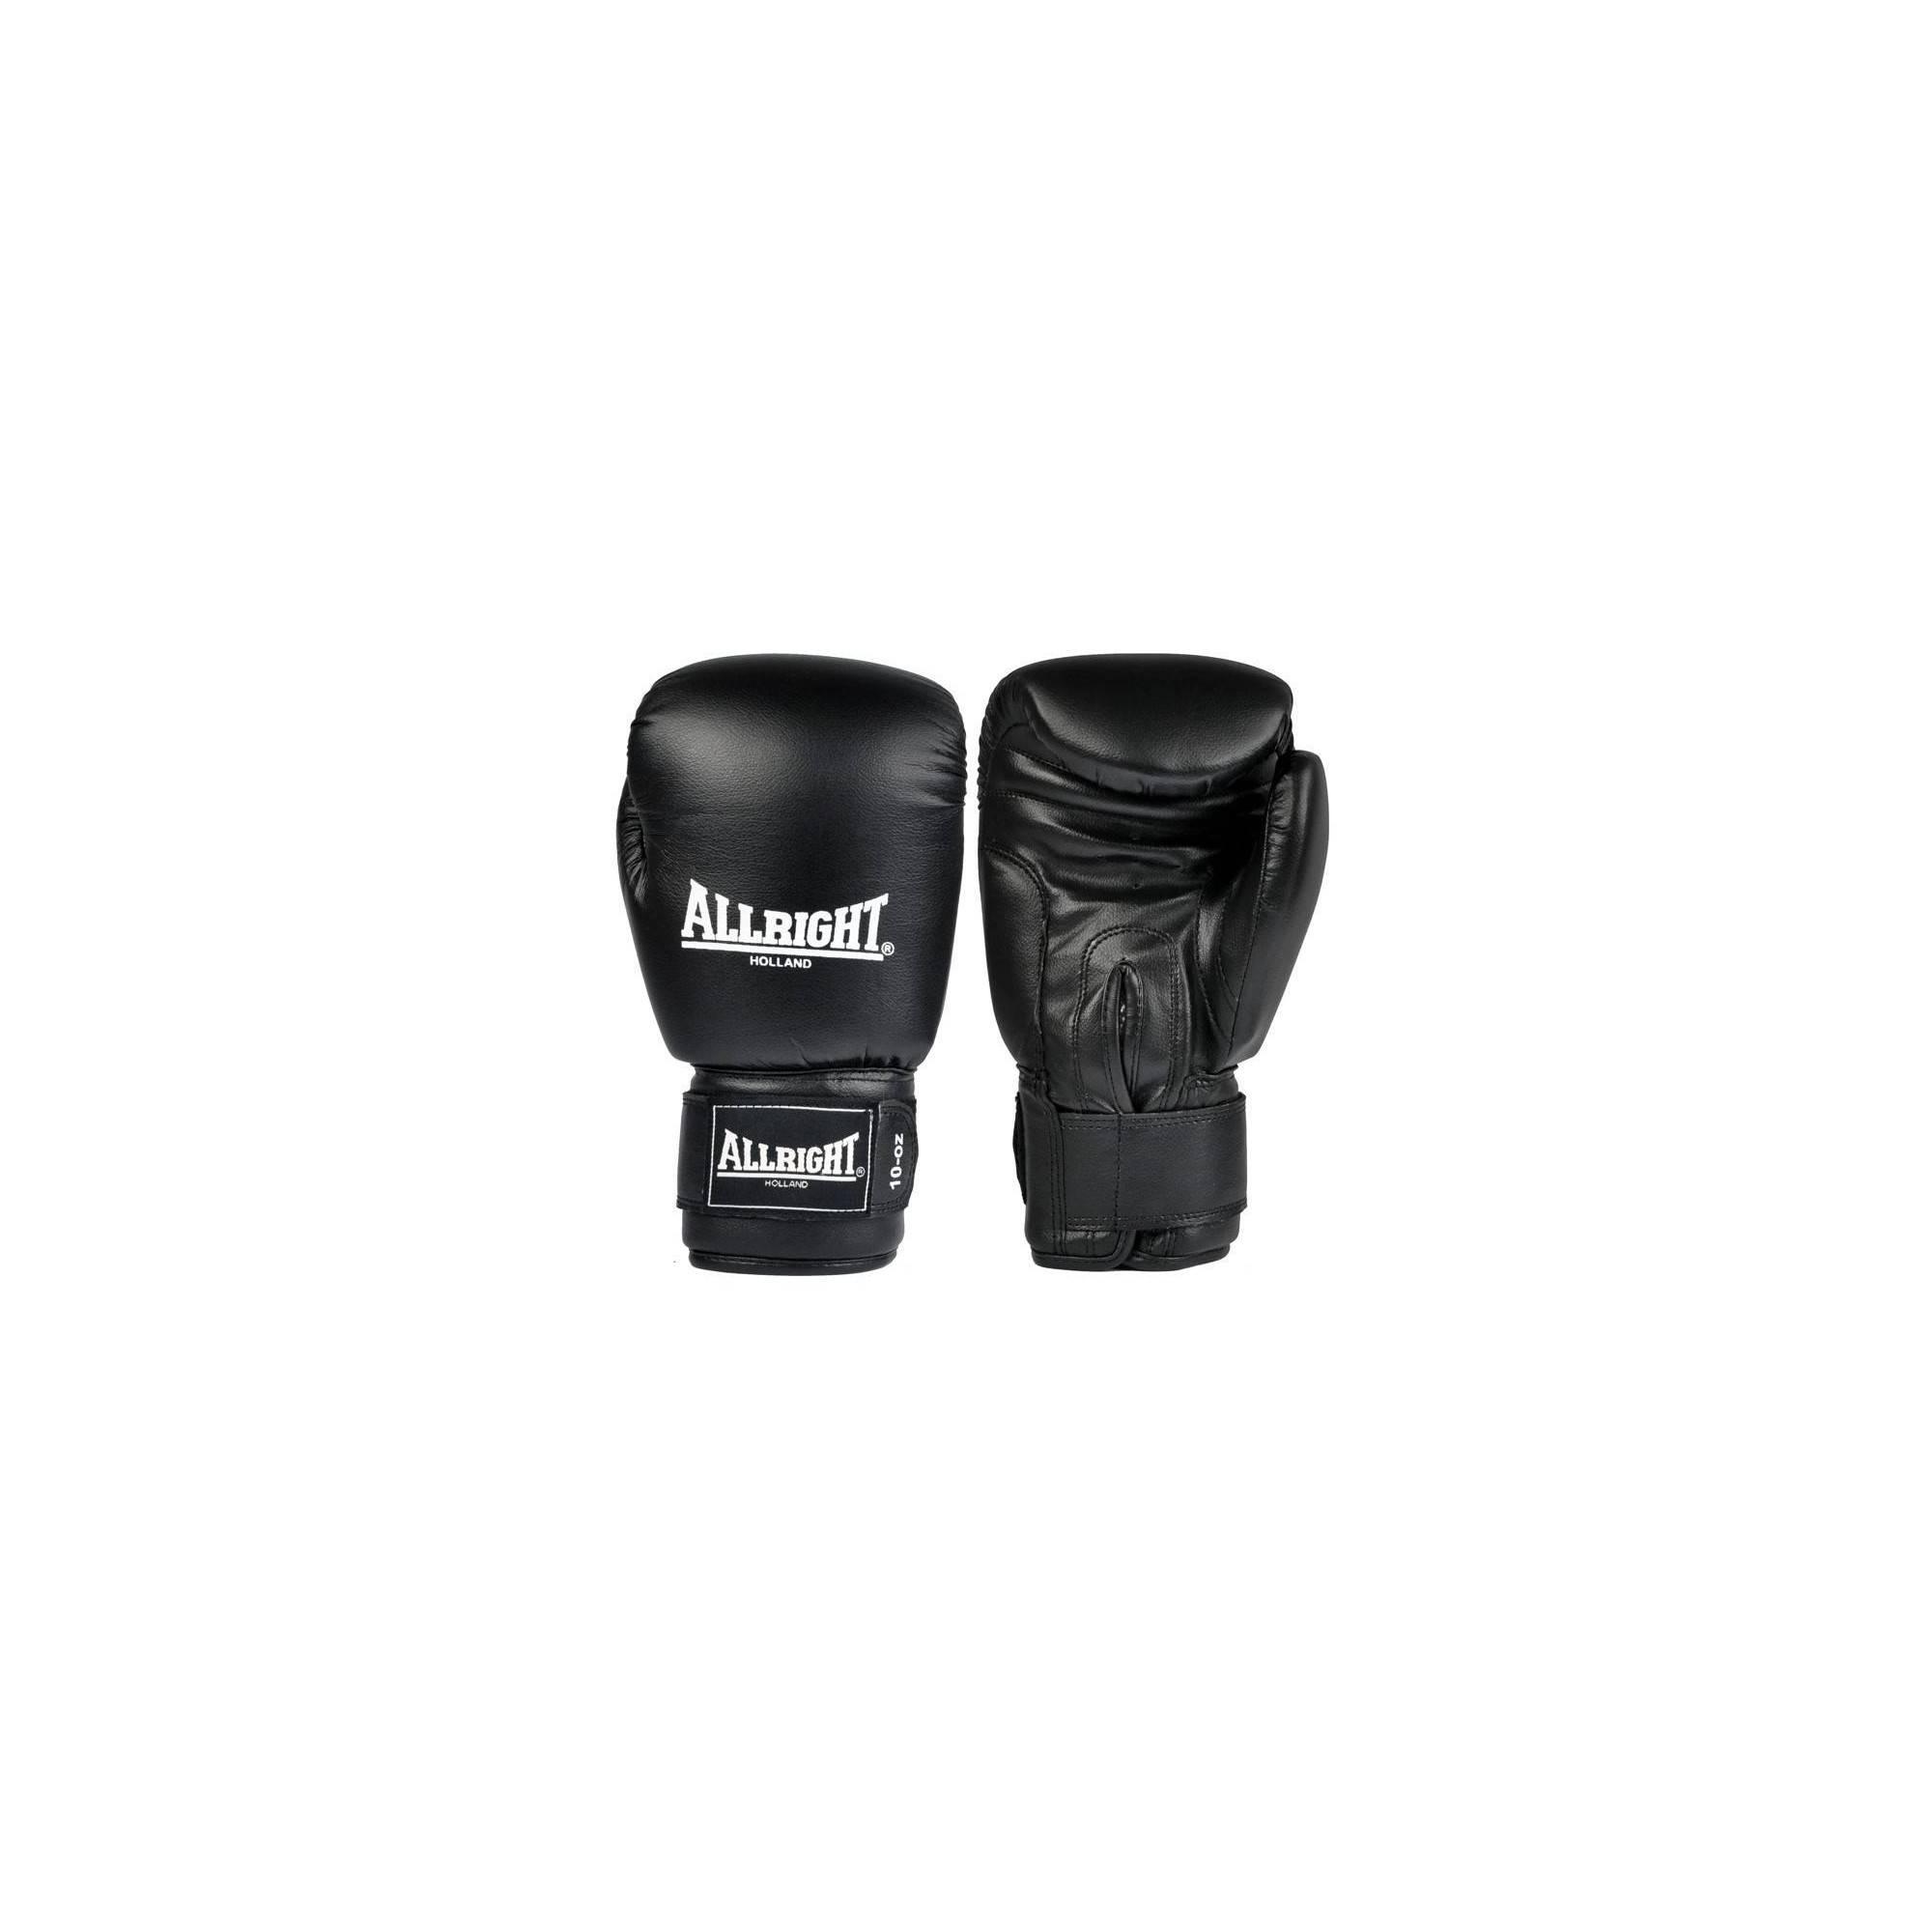 Rękawice bokserskie czarne 14oz Allright | skóra naturalna ALLRIGHT - 1 | klubfitness.pl